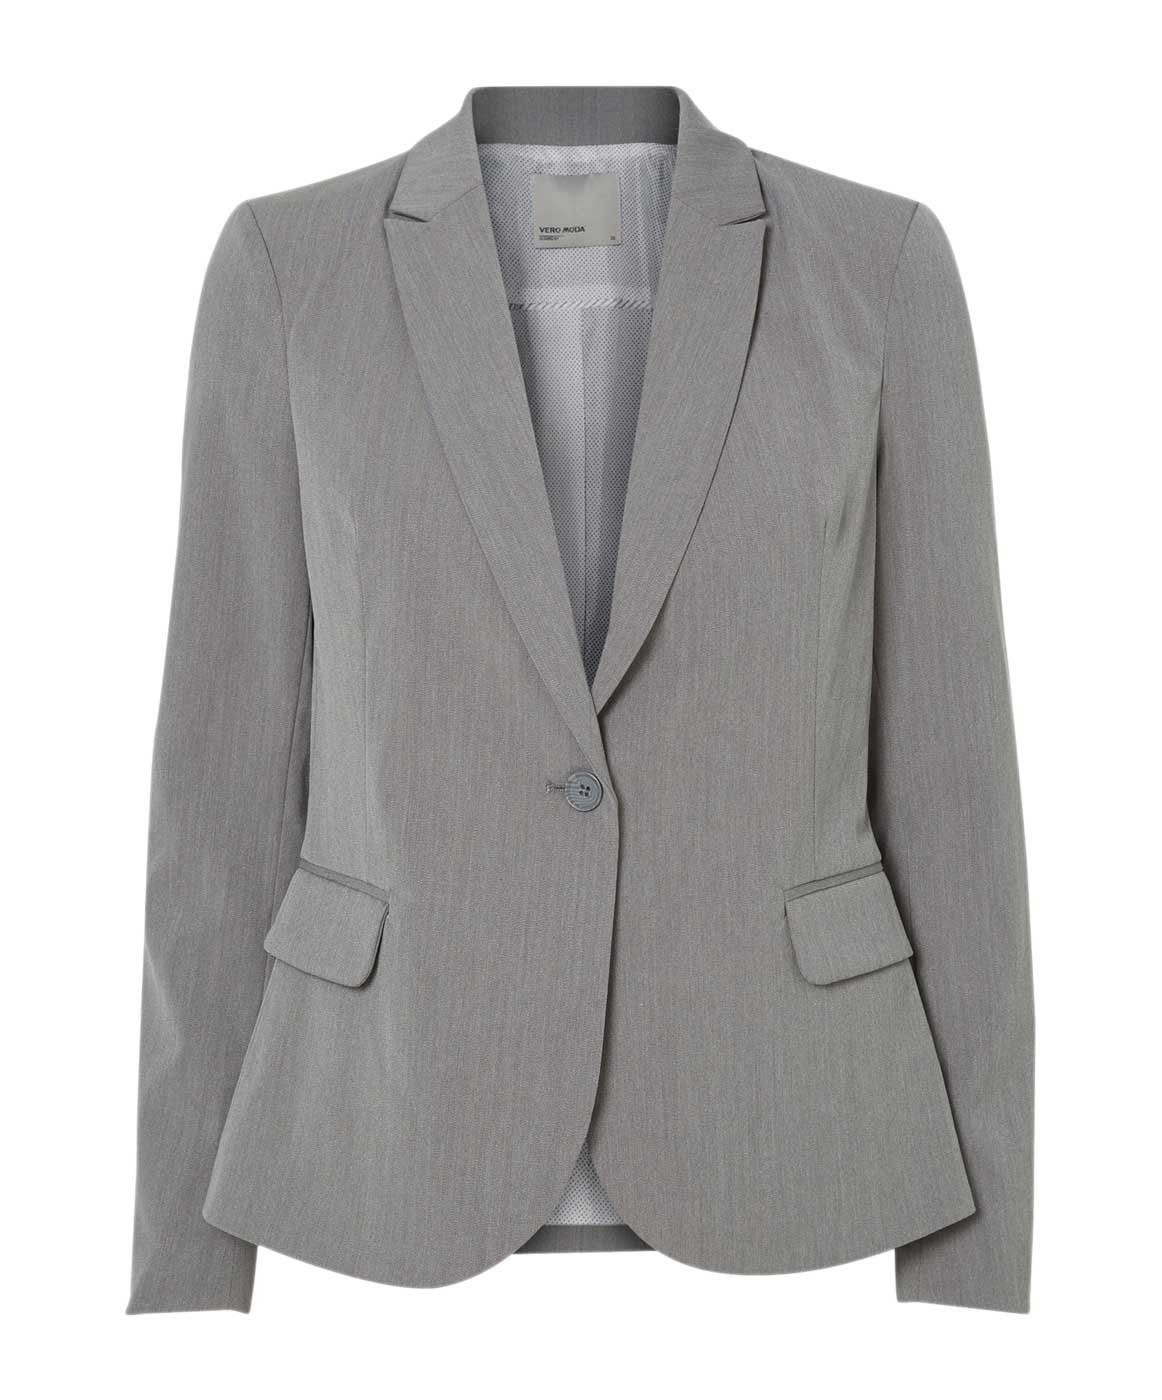 Vero Moda Blazer Regular Fit Roro Blazer in Grey Melange